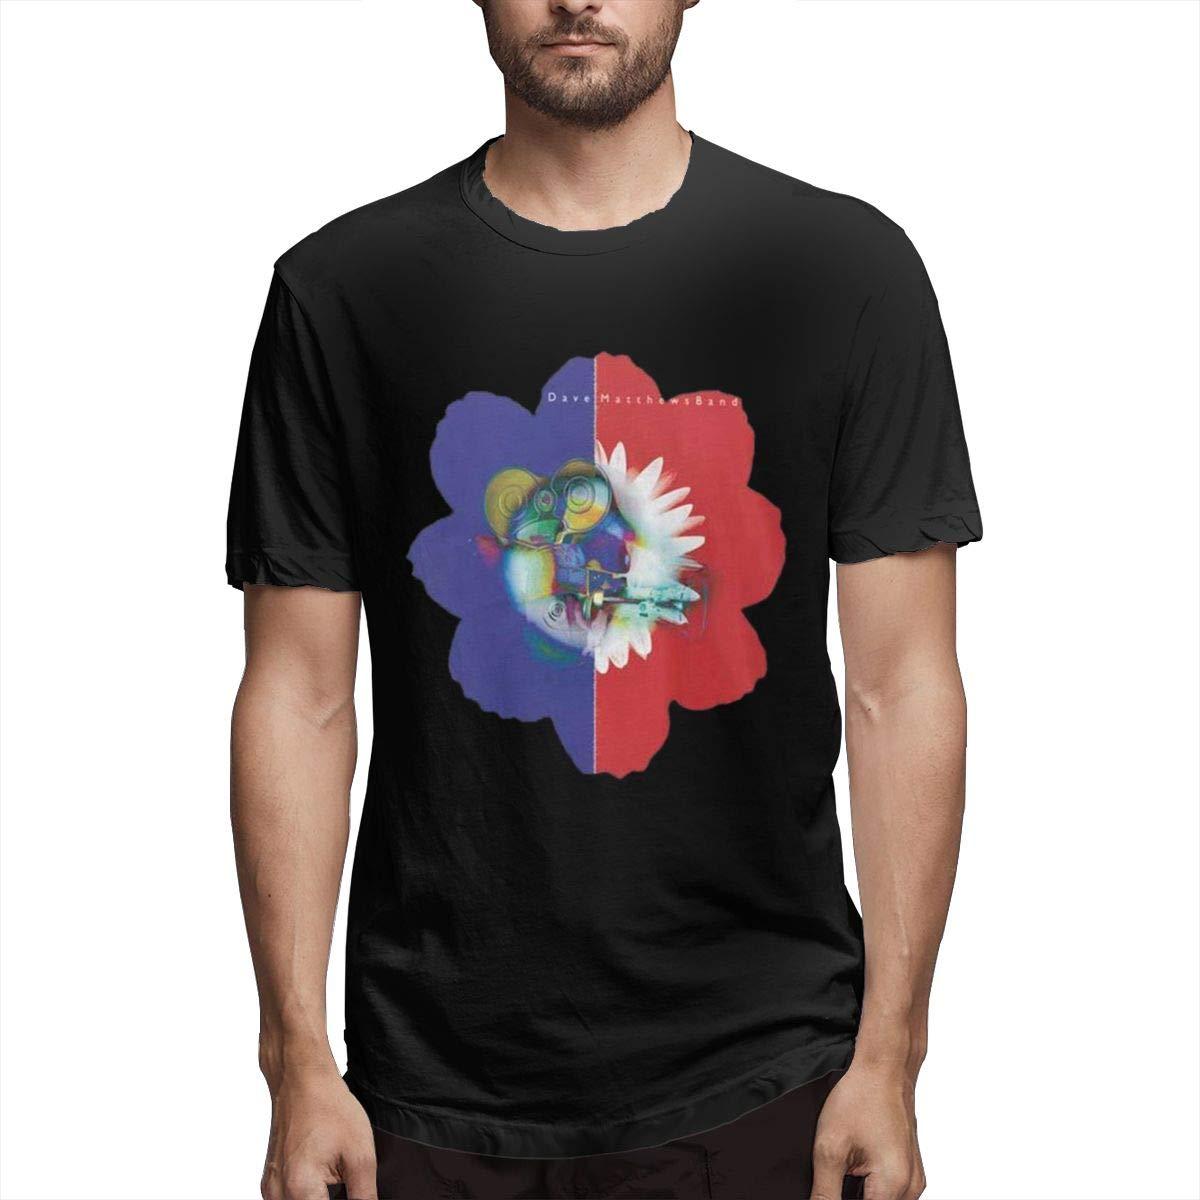 Dave Matthews Retro Vintage Shirt 1850